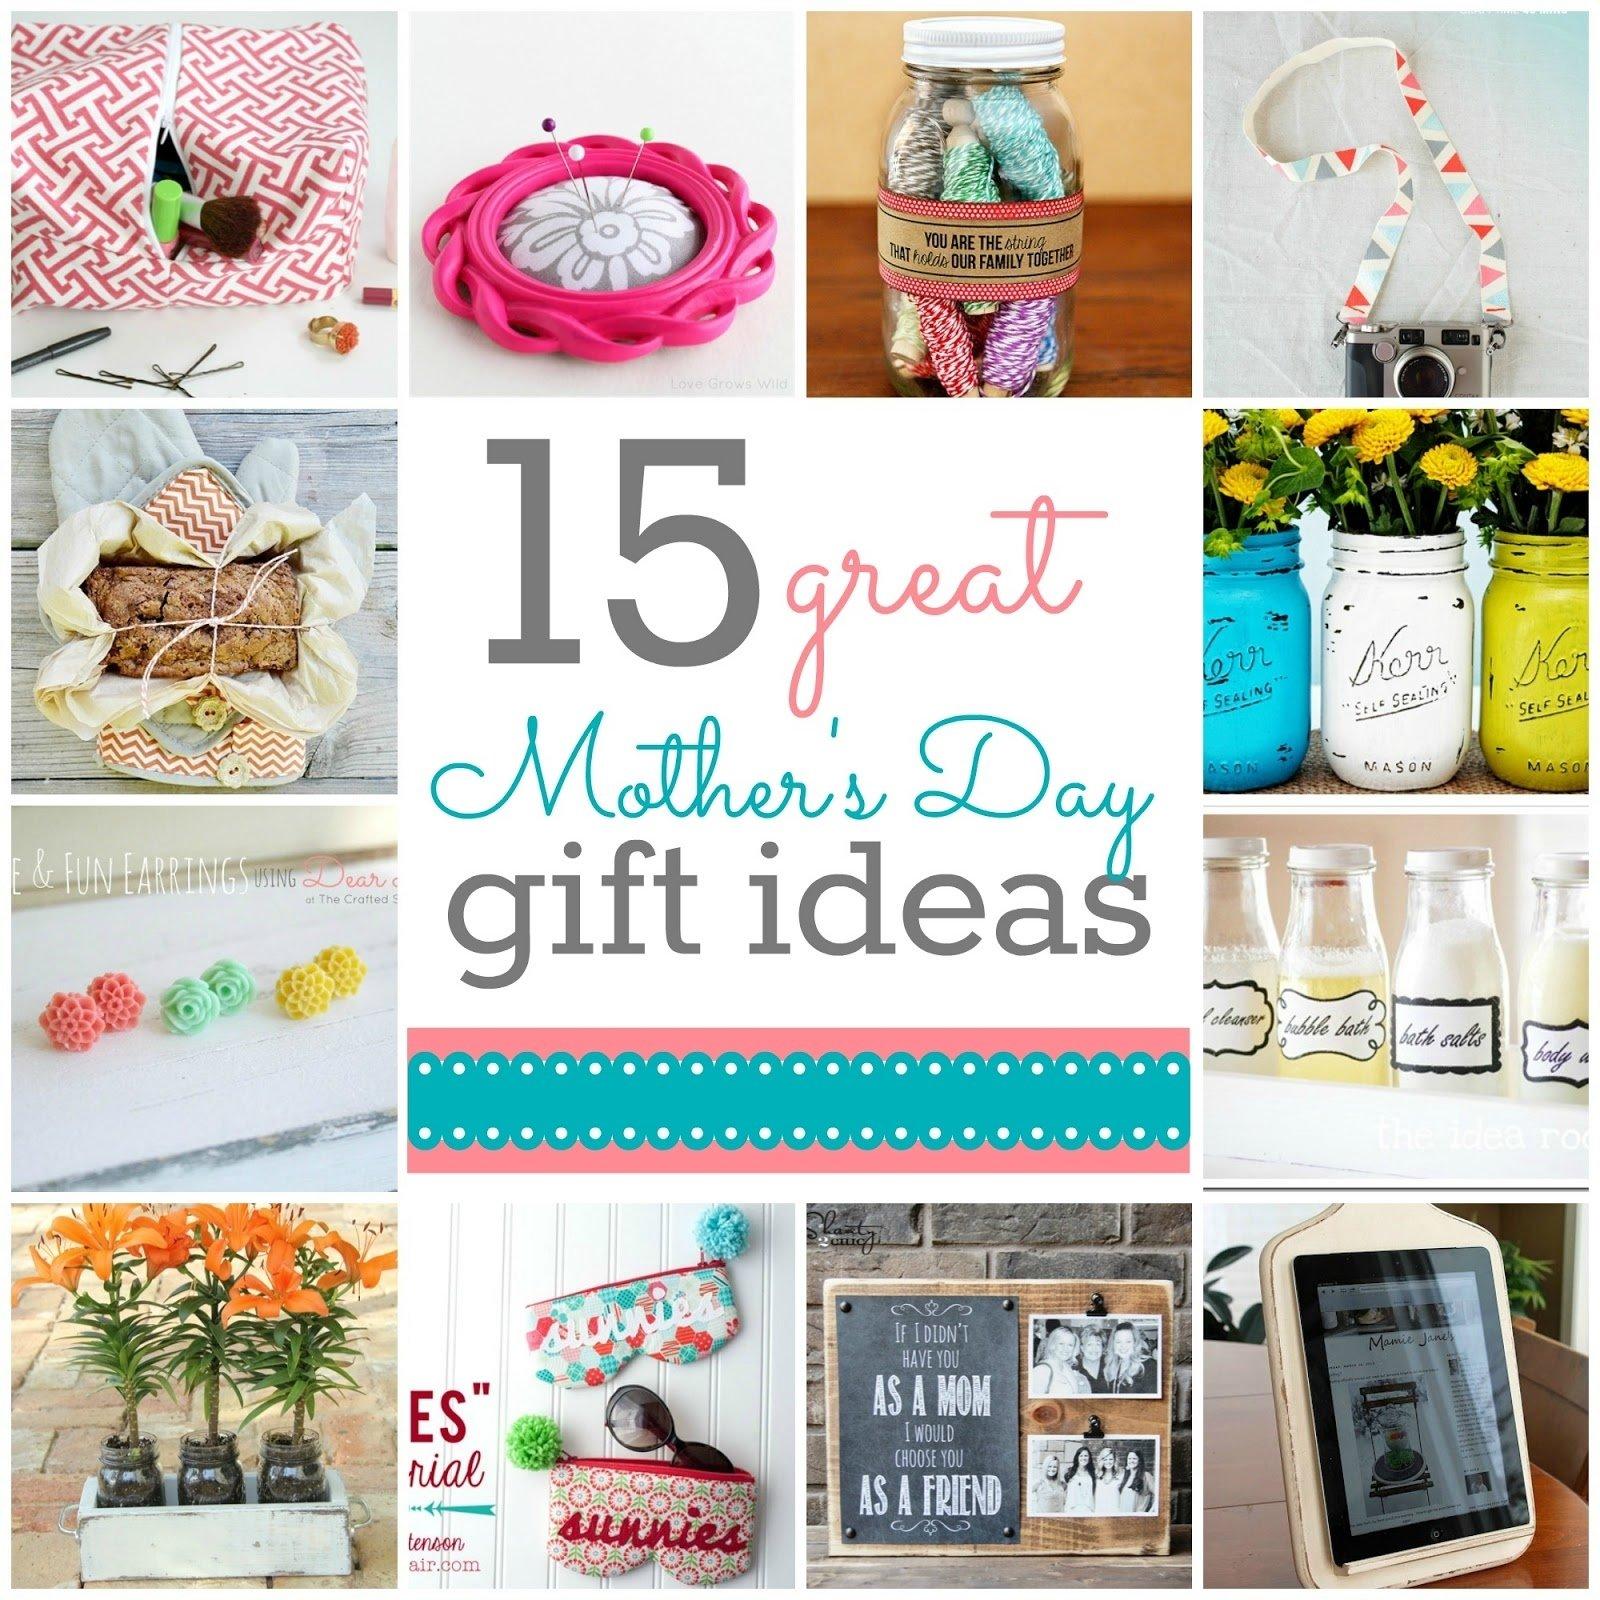 10 Famous Good Christmas Ideas For Mom mom gifts ideas mforum 2020